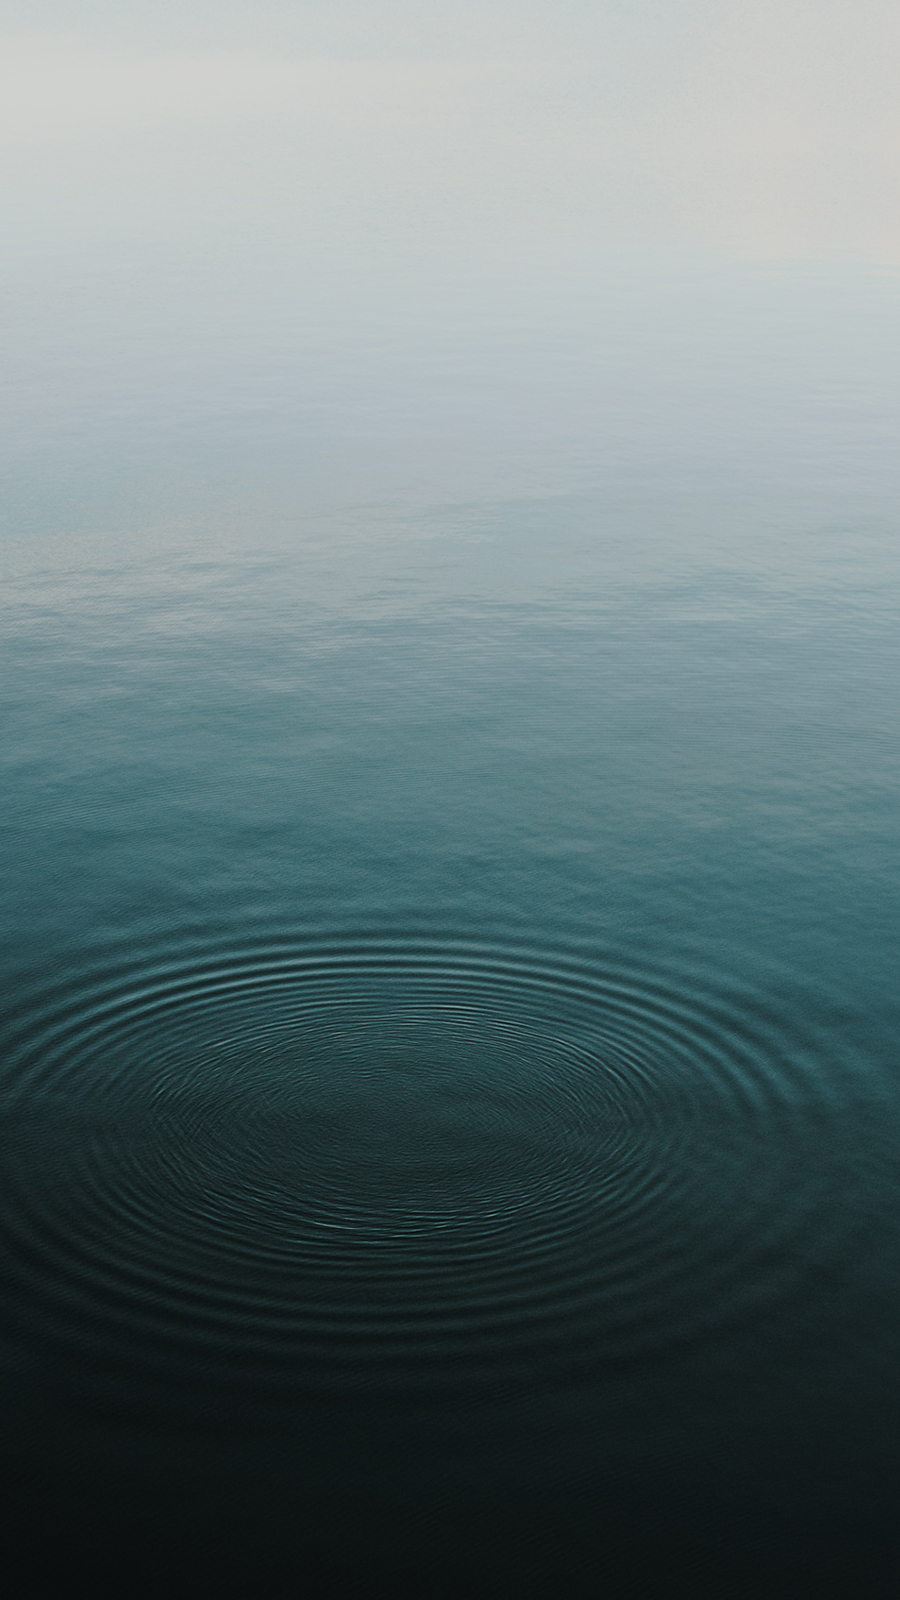 Water, Sea, Lake, Wallpapers Free Download Phone & Desktop